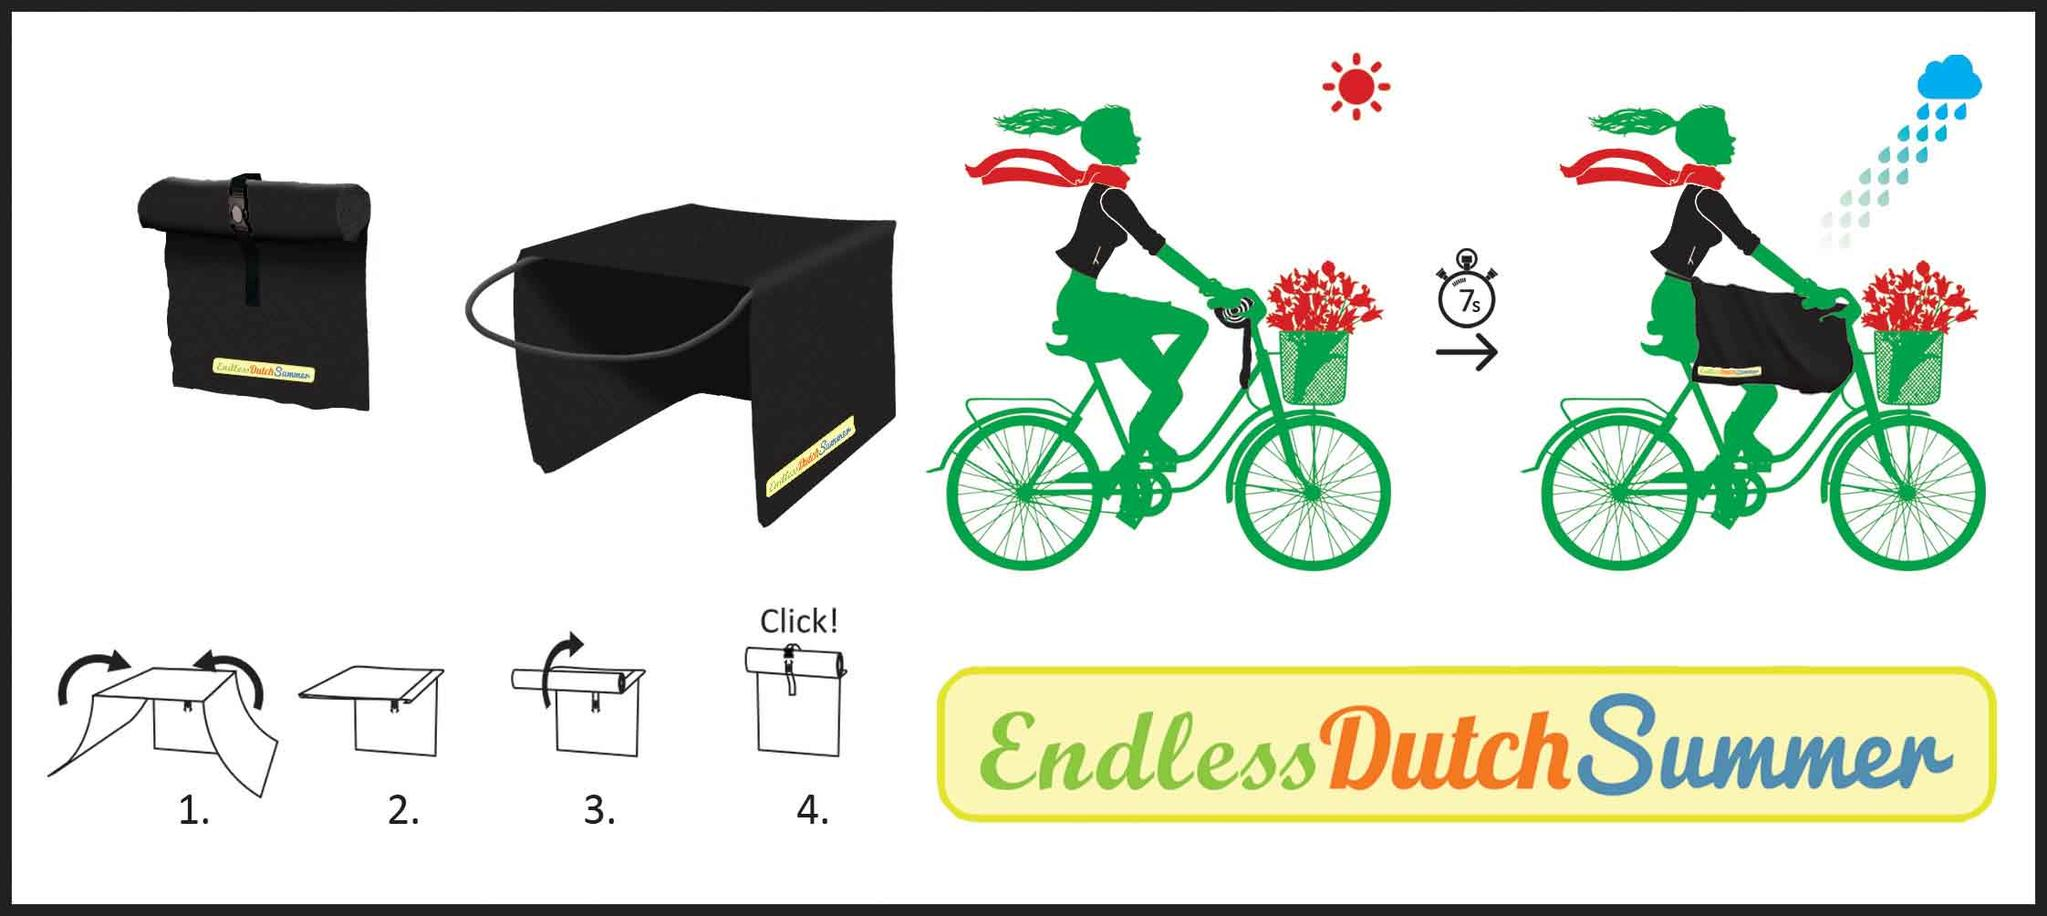 Fahrrad-Bein-Regenmantel